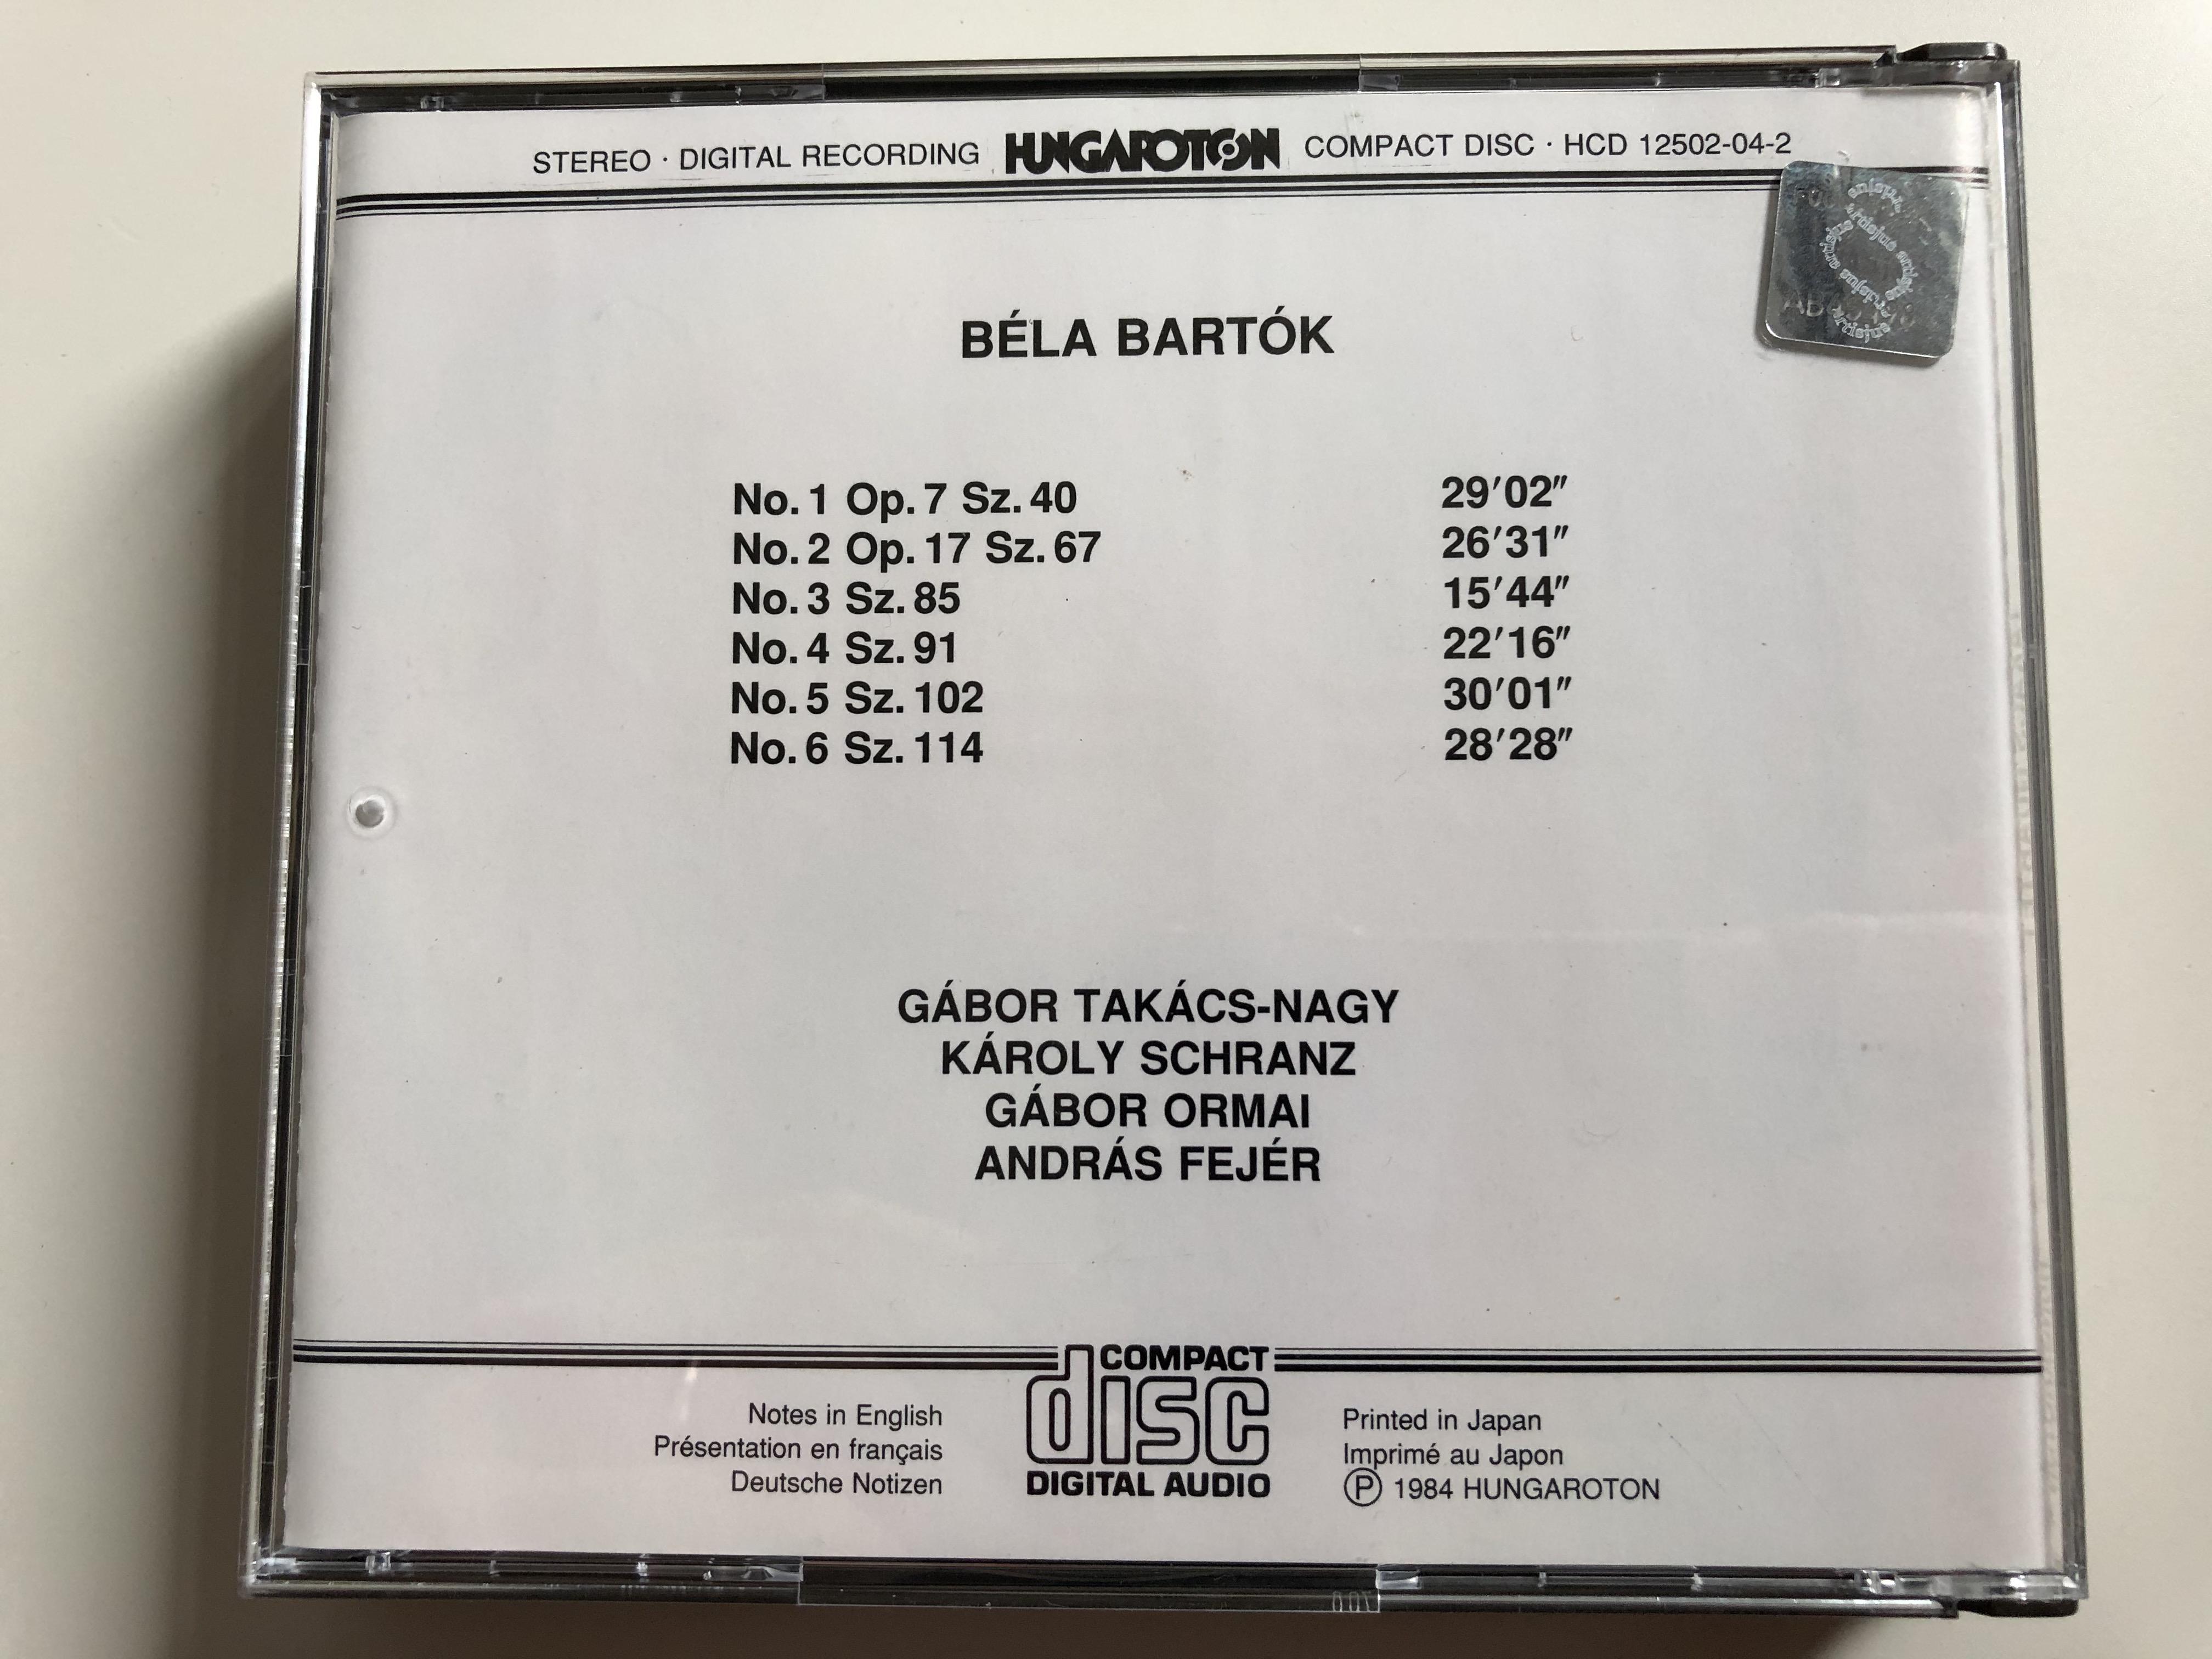 bart-k-the-string-quartets-complete-tak-cs-quartet-hungaroton-3x-audio-cd-1995-stereo-hcd-12502-04-2-5-.jpg